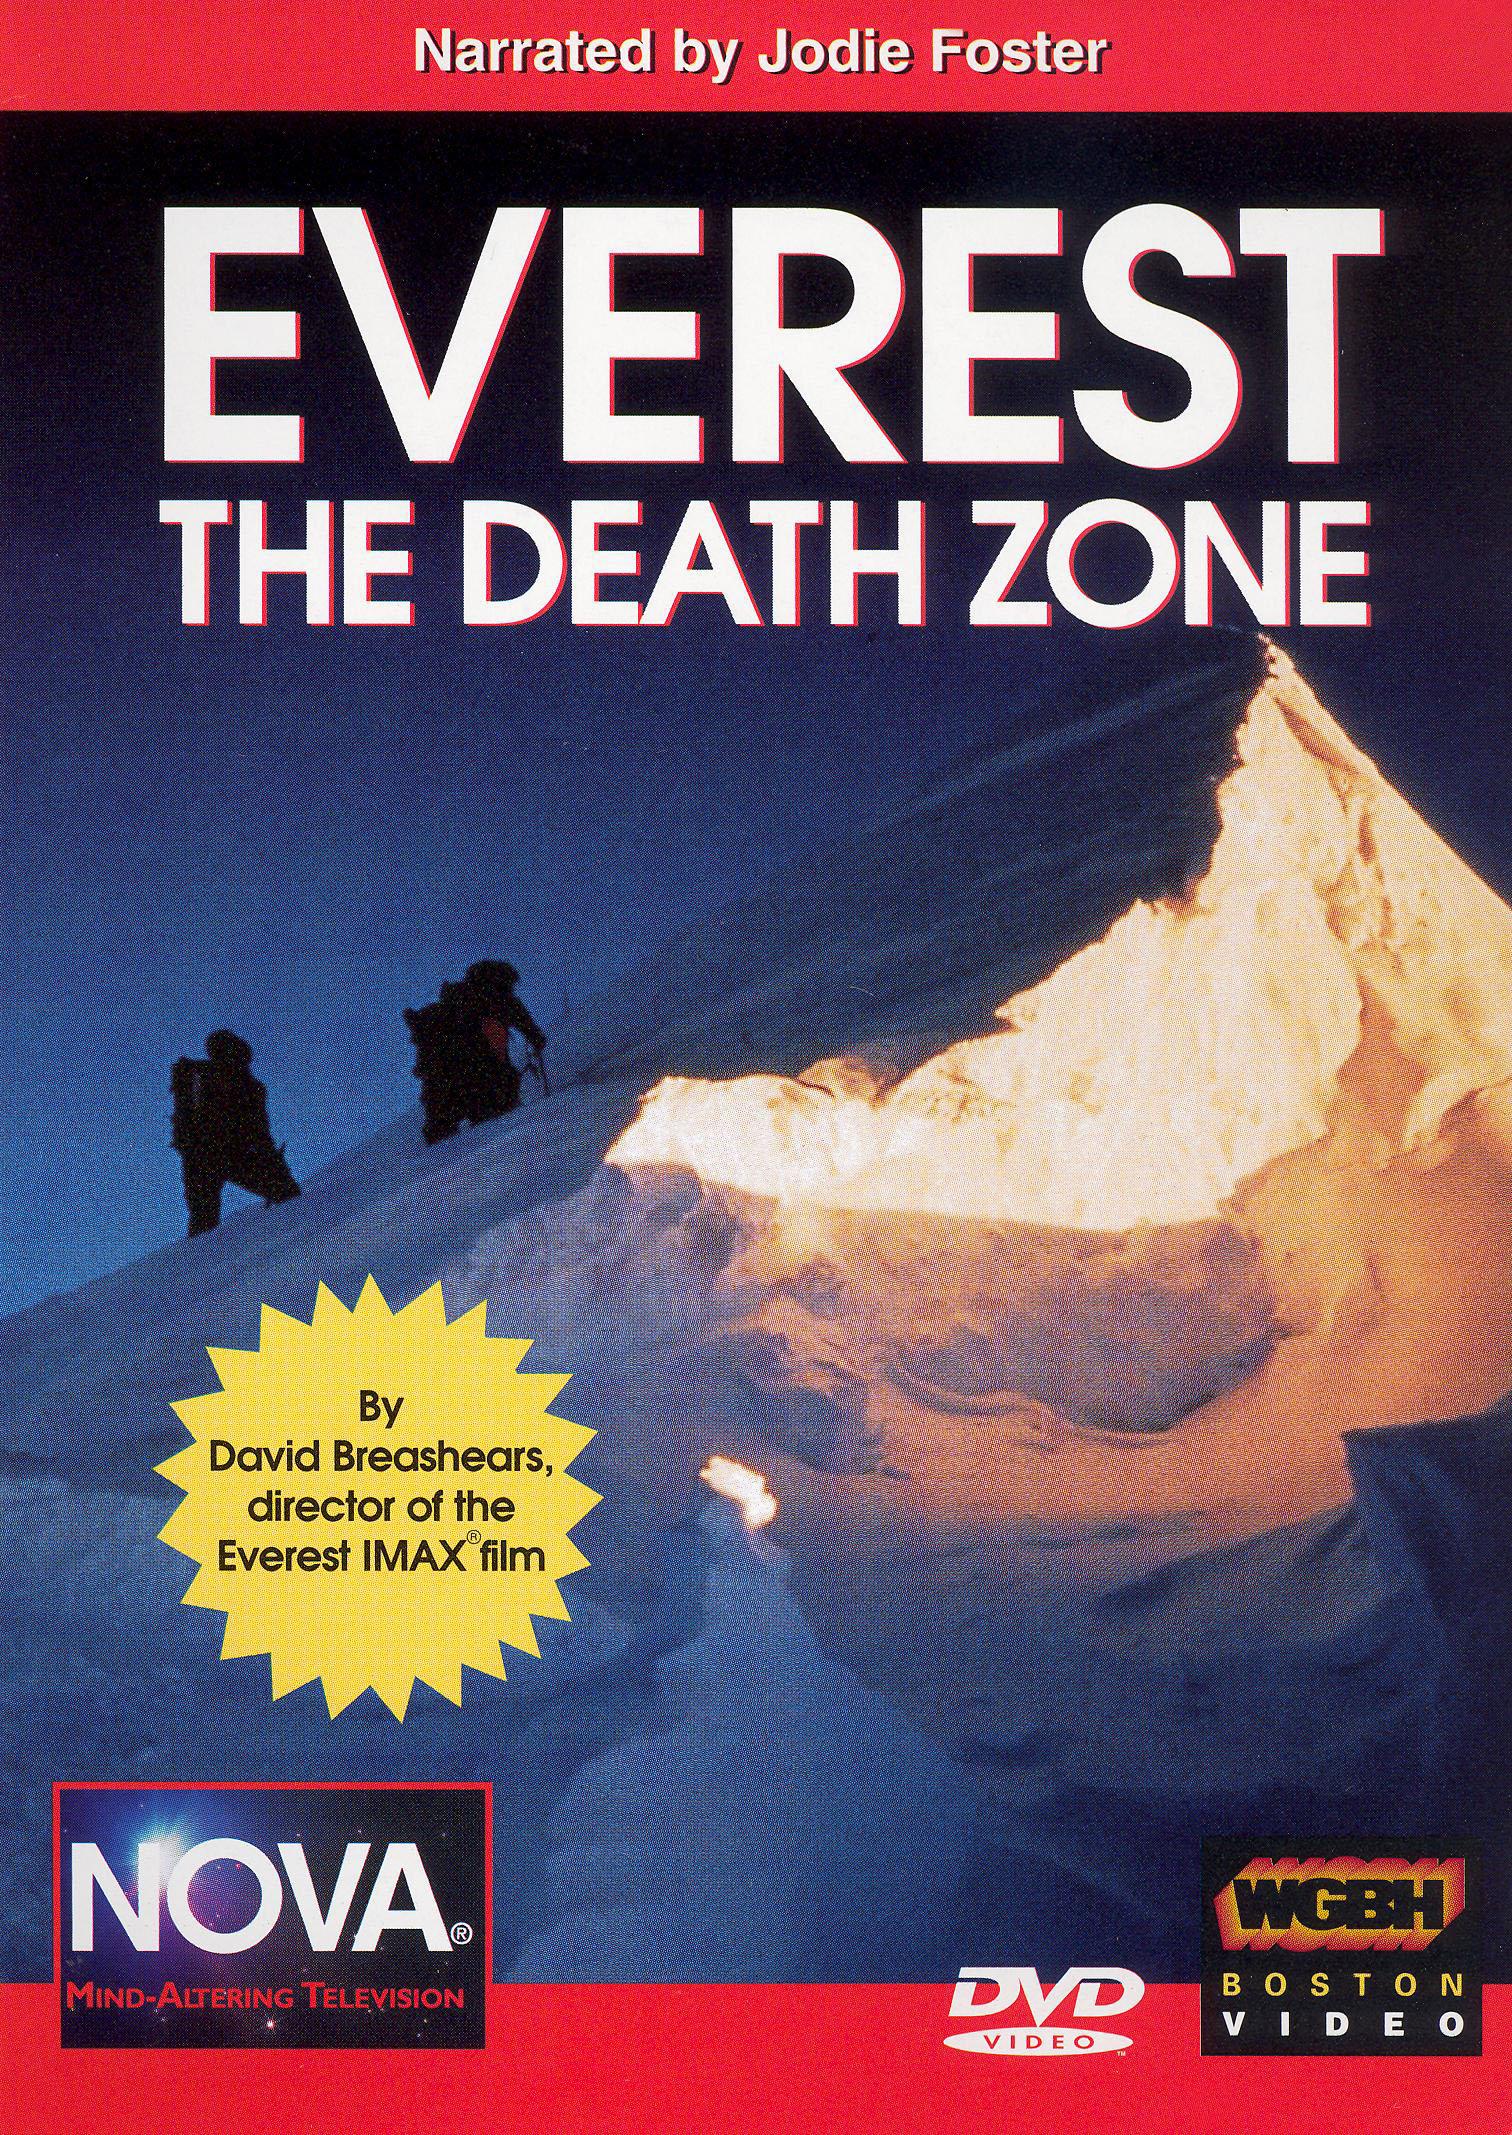 Nova Everest Death Zone Movie HD free download 720p